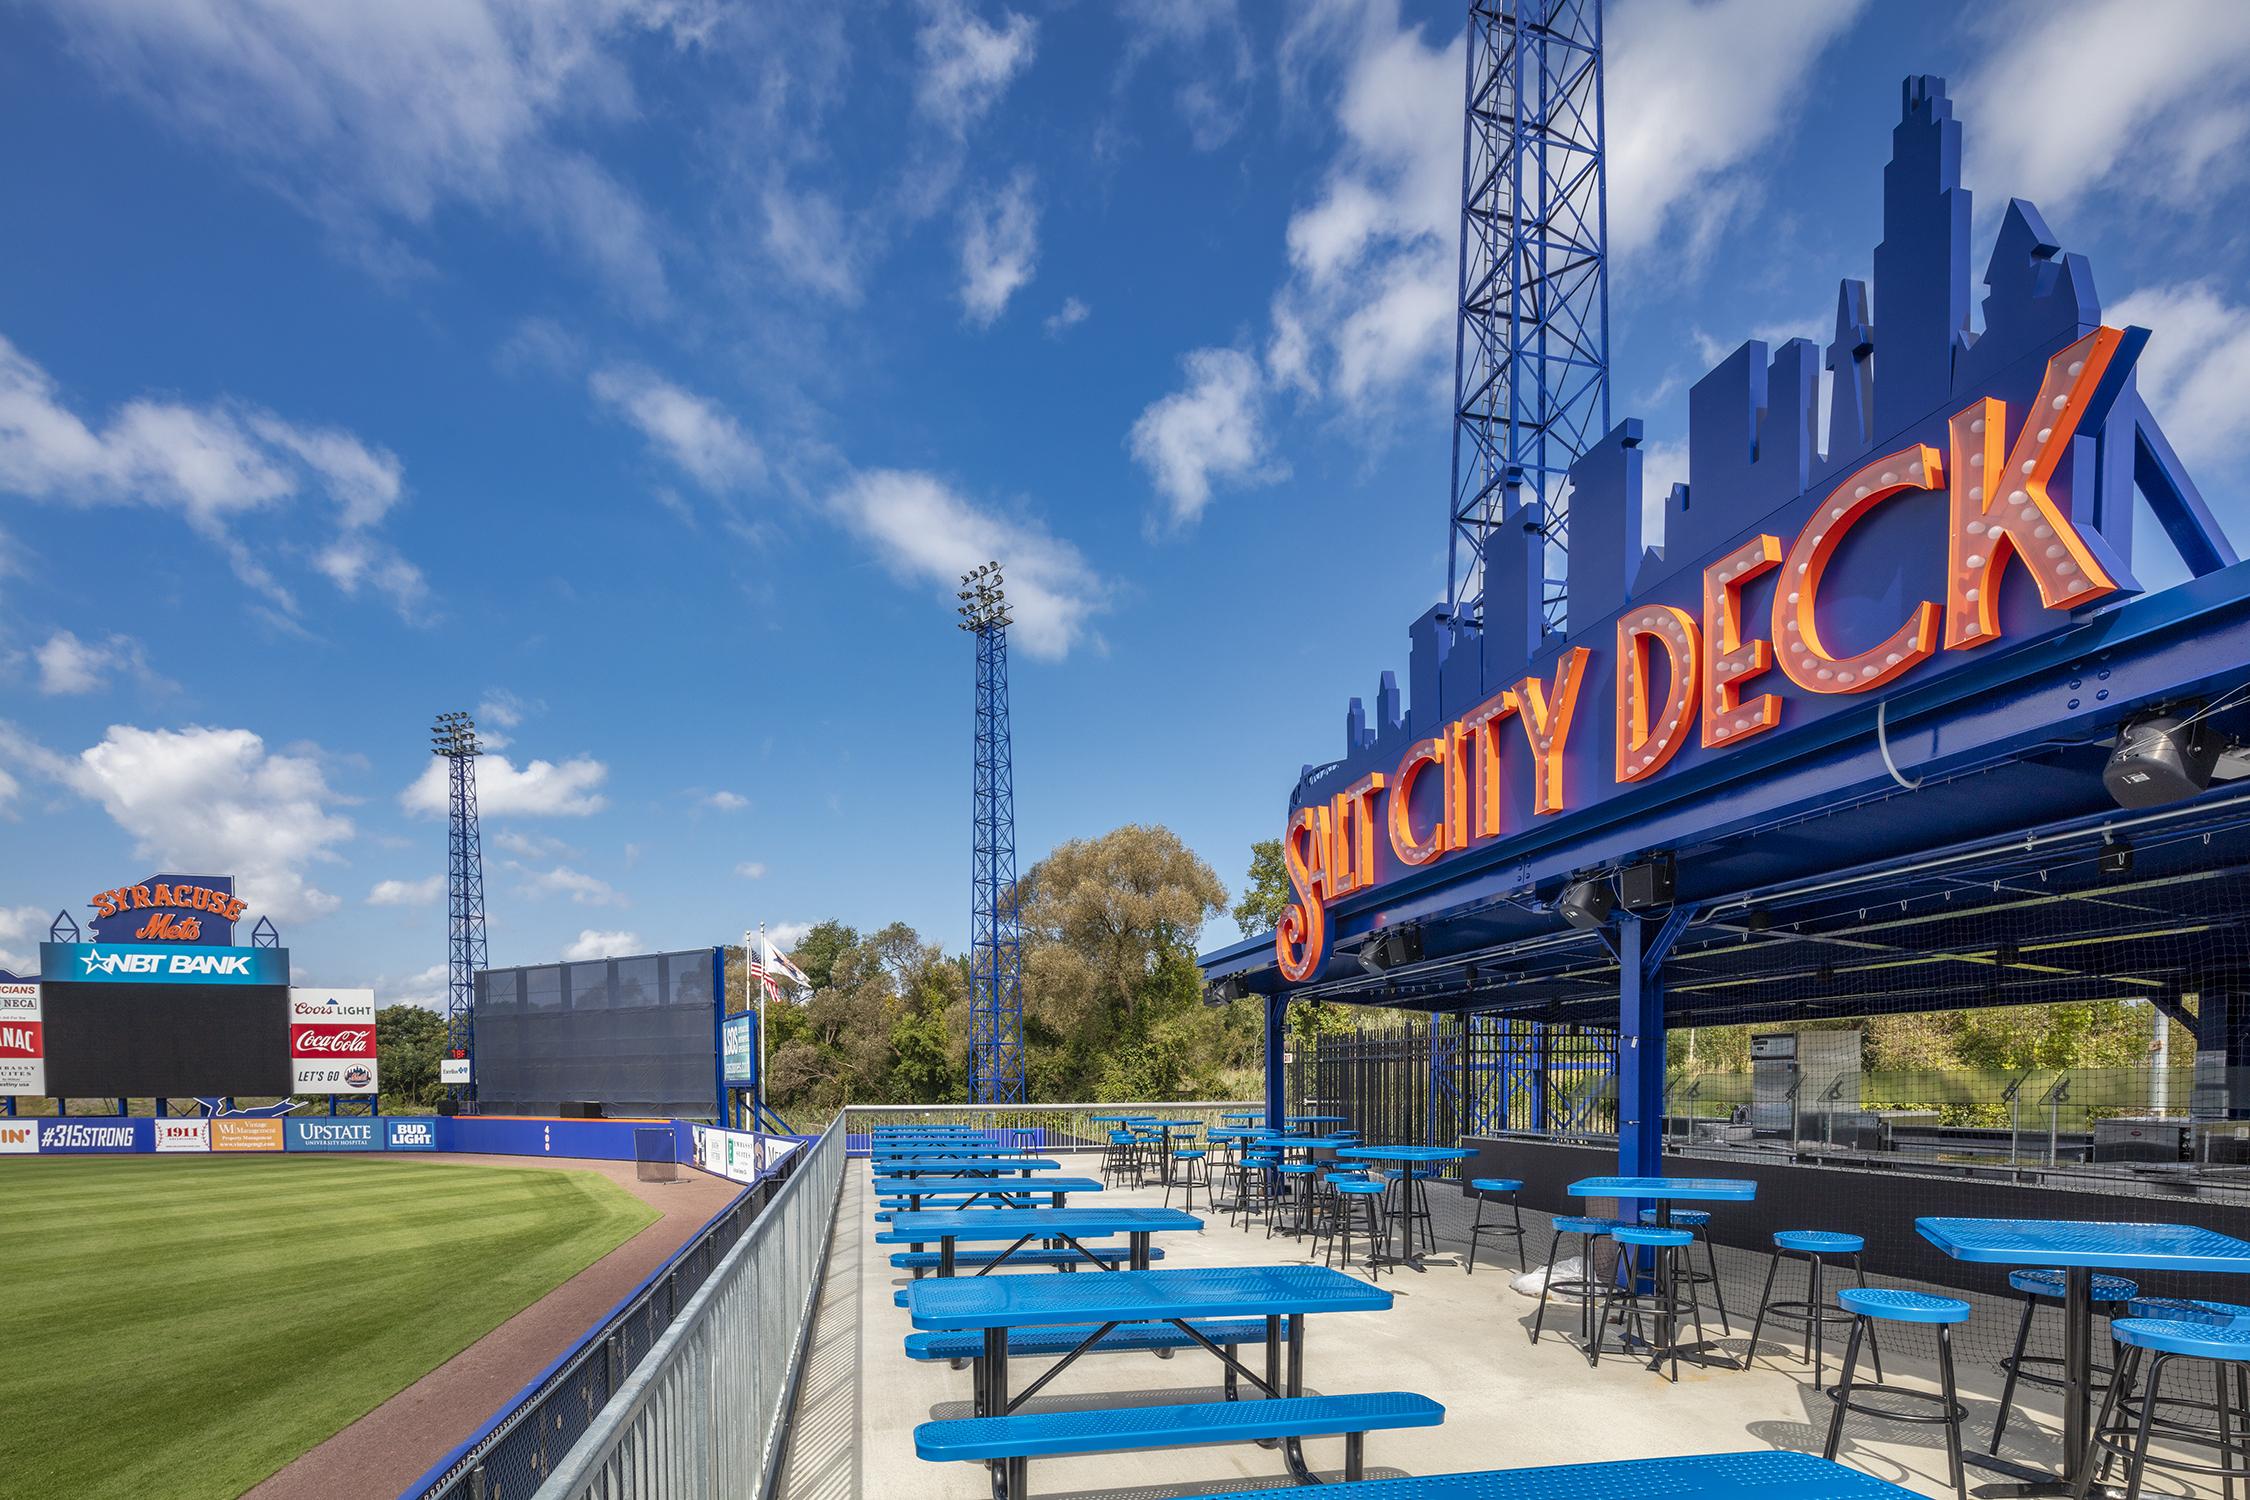 NBT Bank Stadium's Salt City Deck